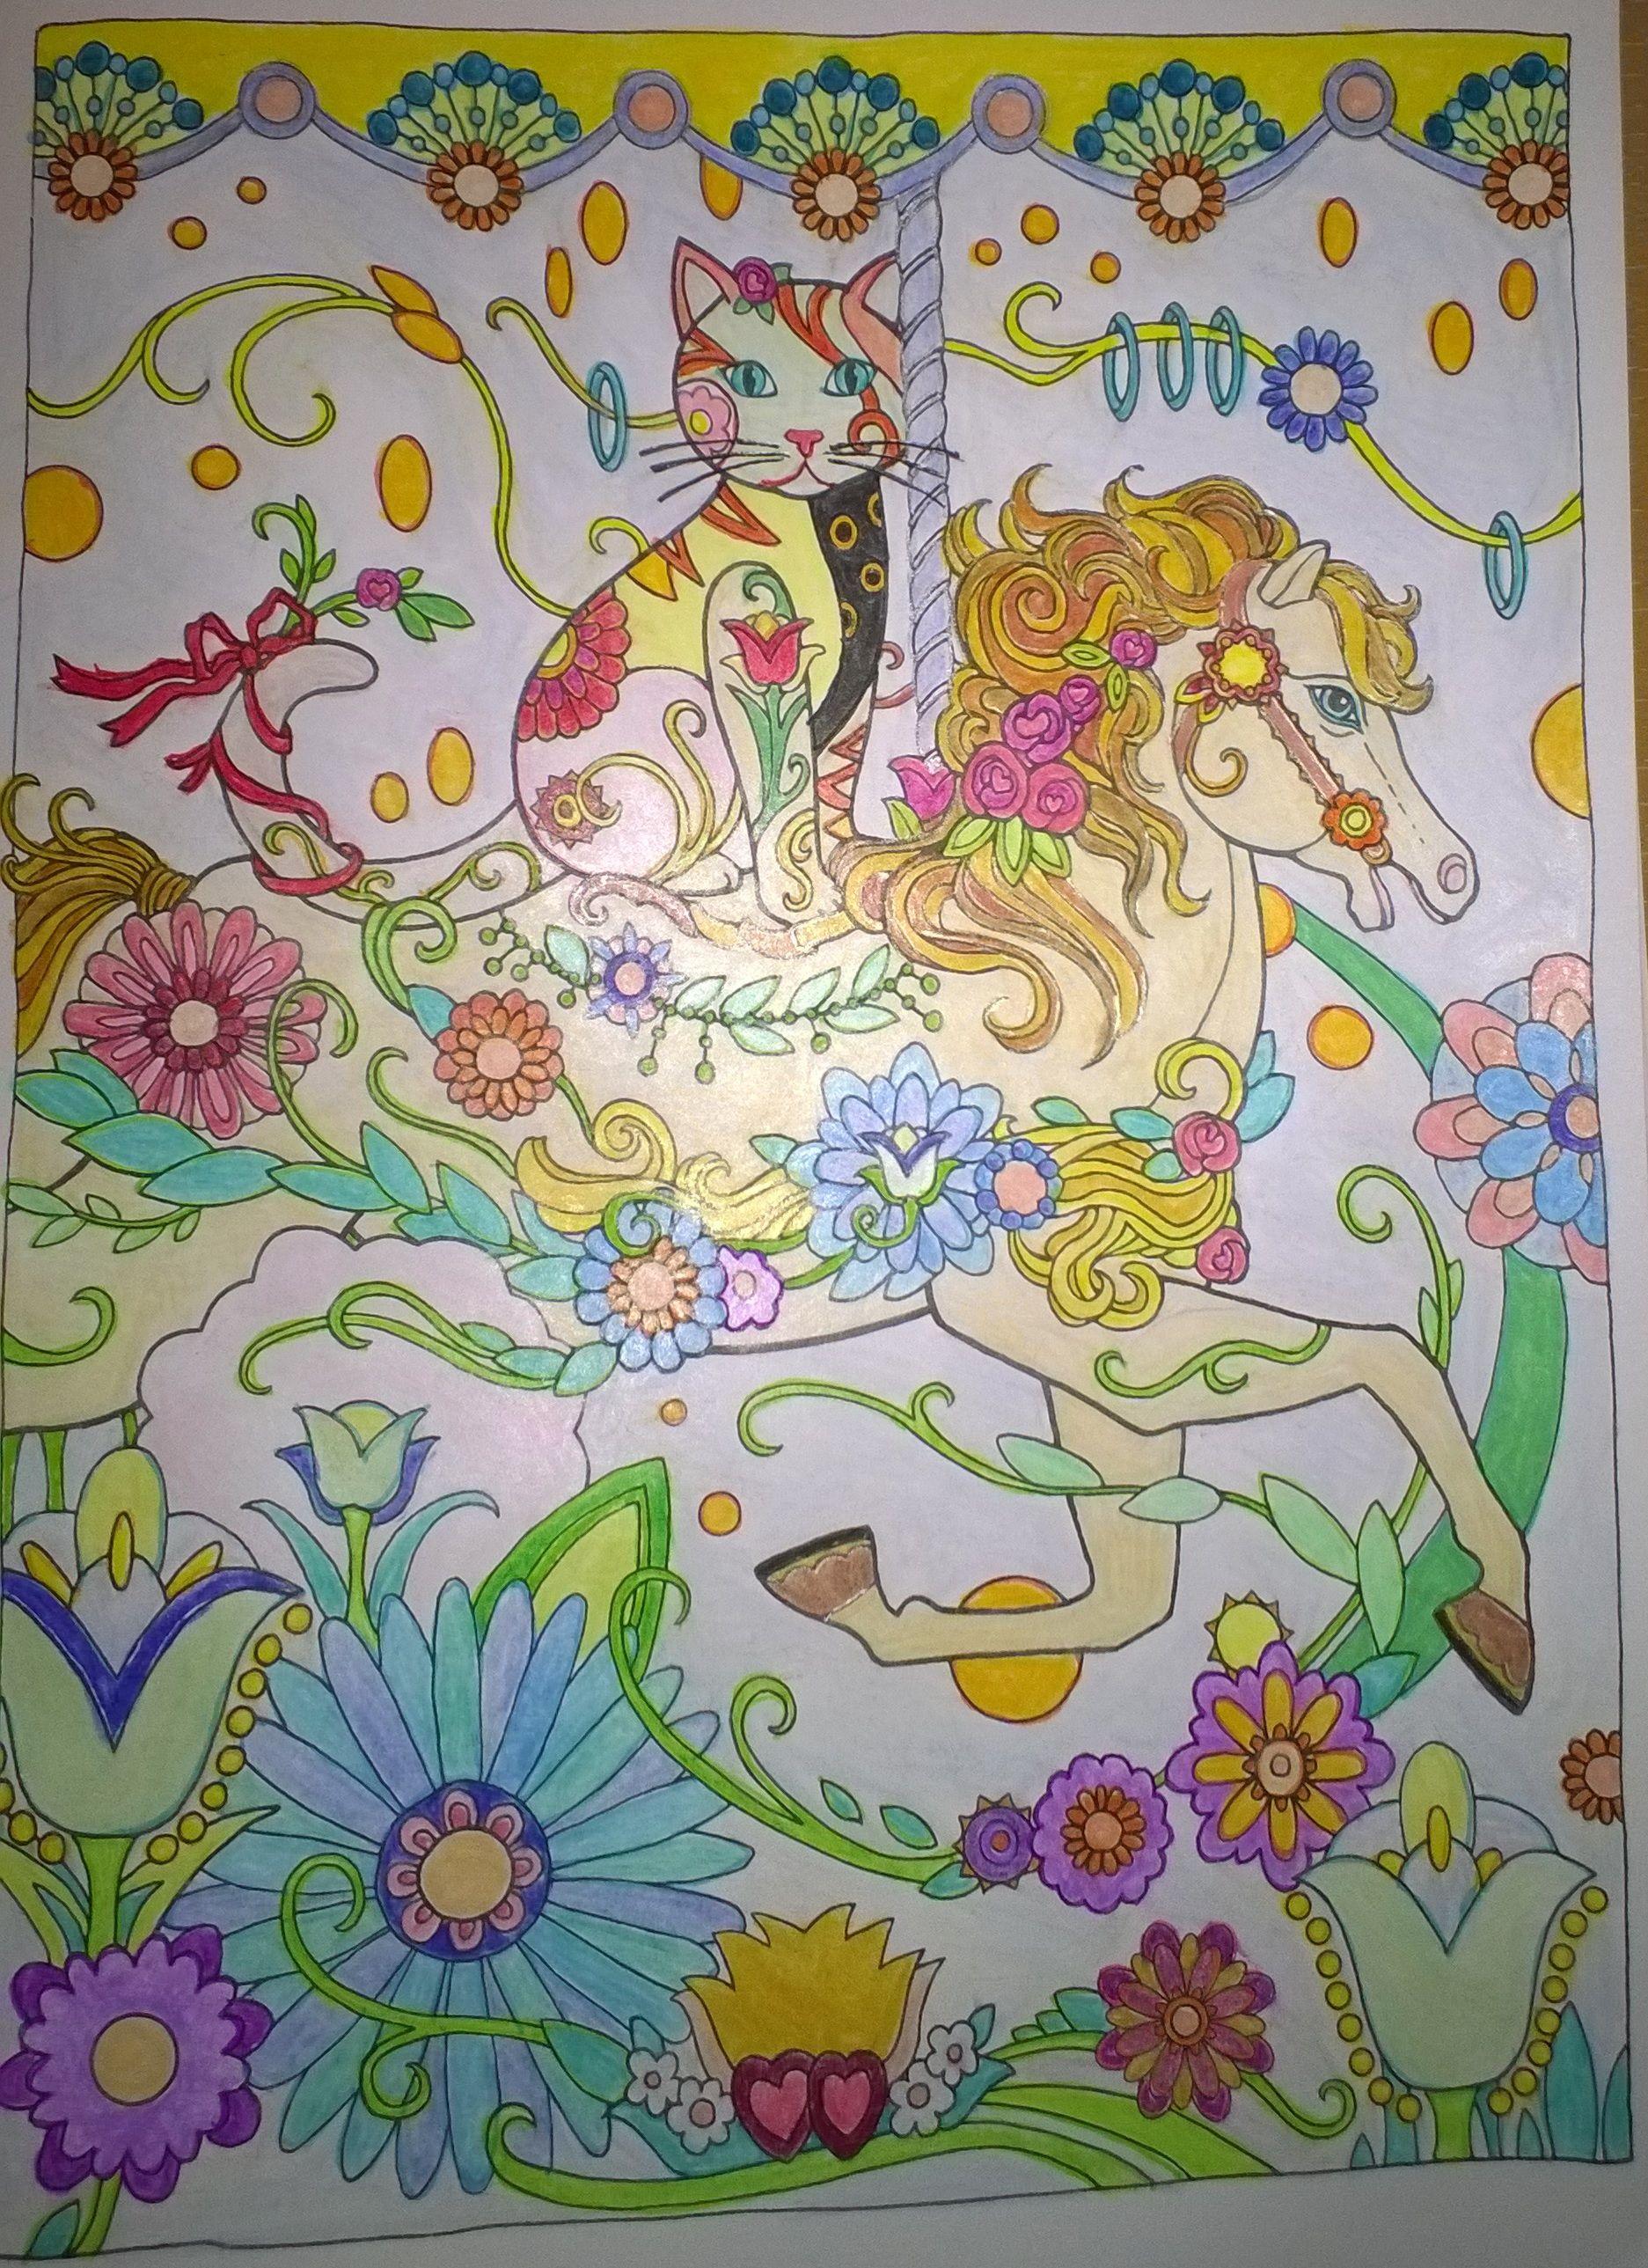 Pin by göknur karaduman on coloring by me pinterest creative